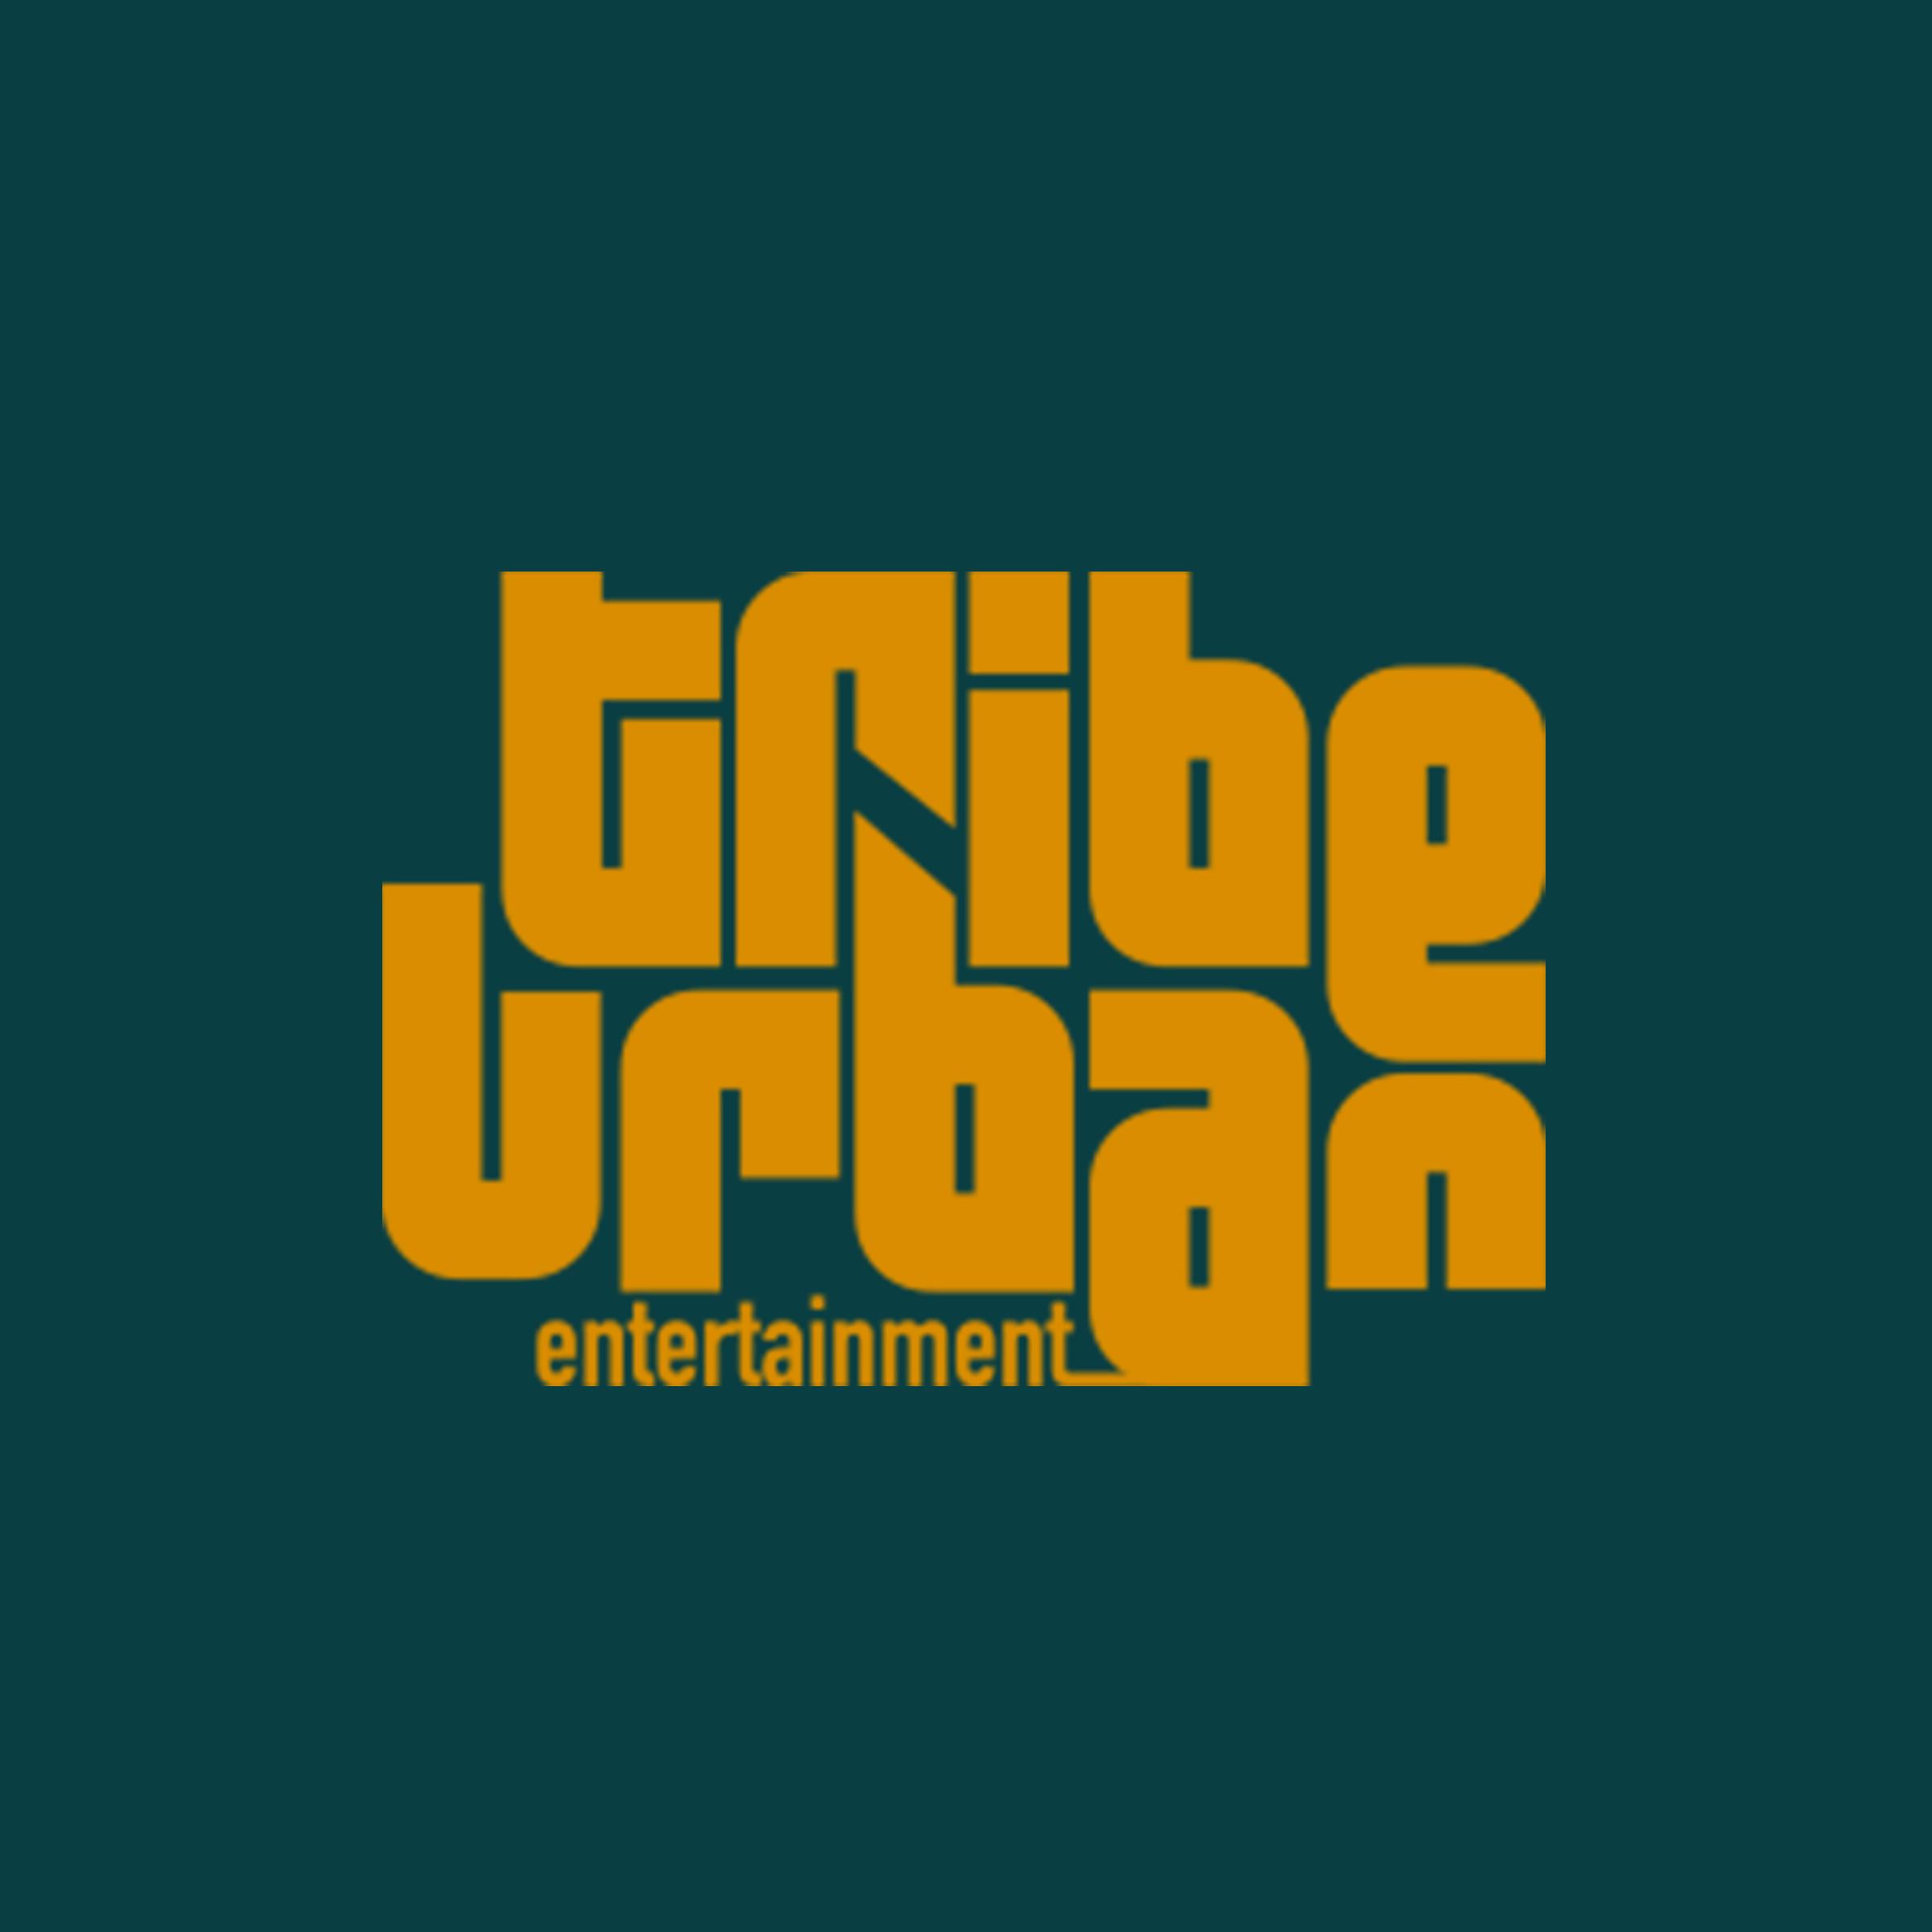 Tribe Urban Entertainment internships in Greater London, London